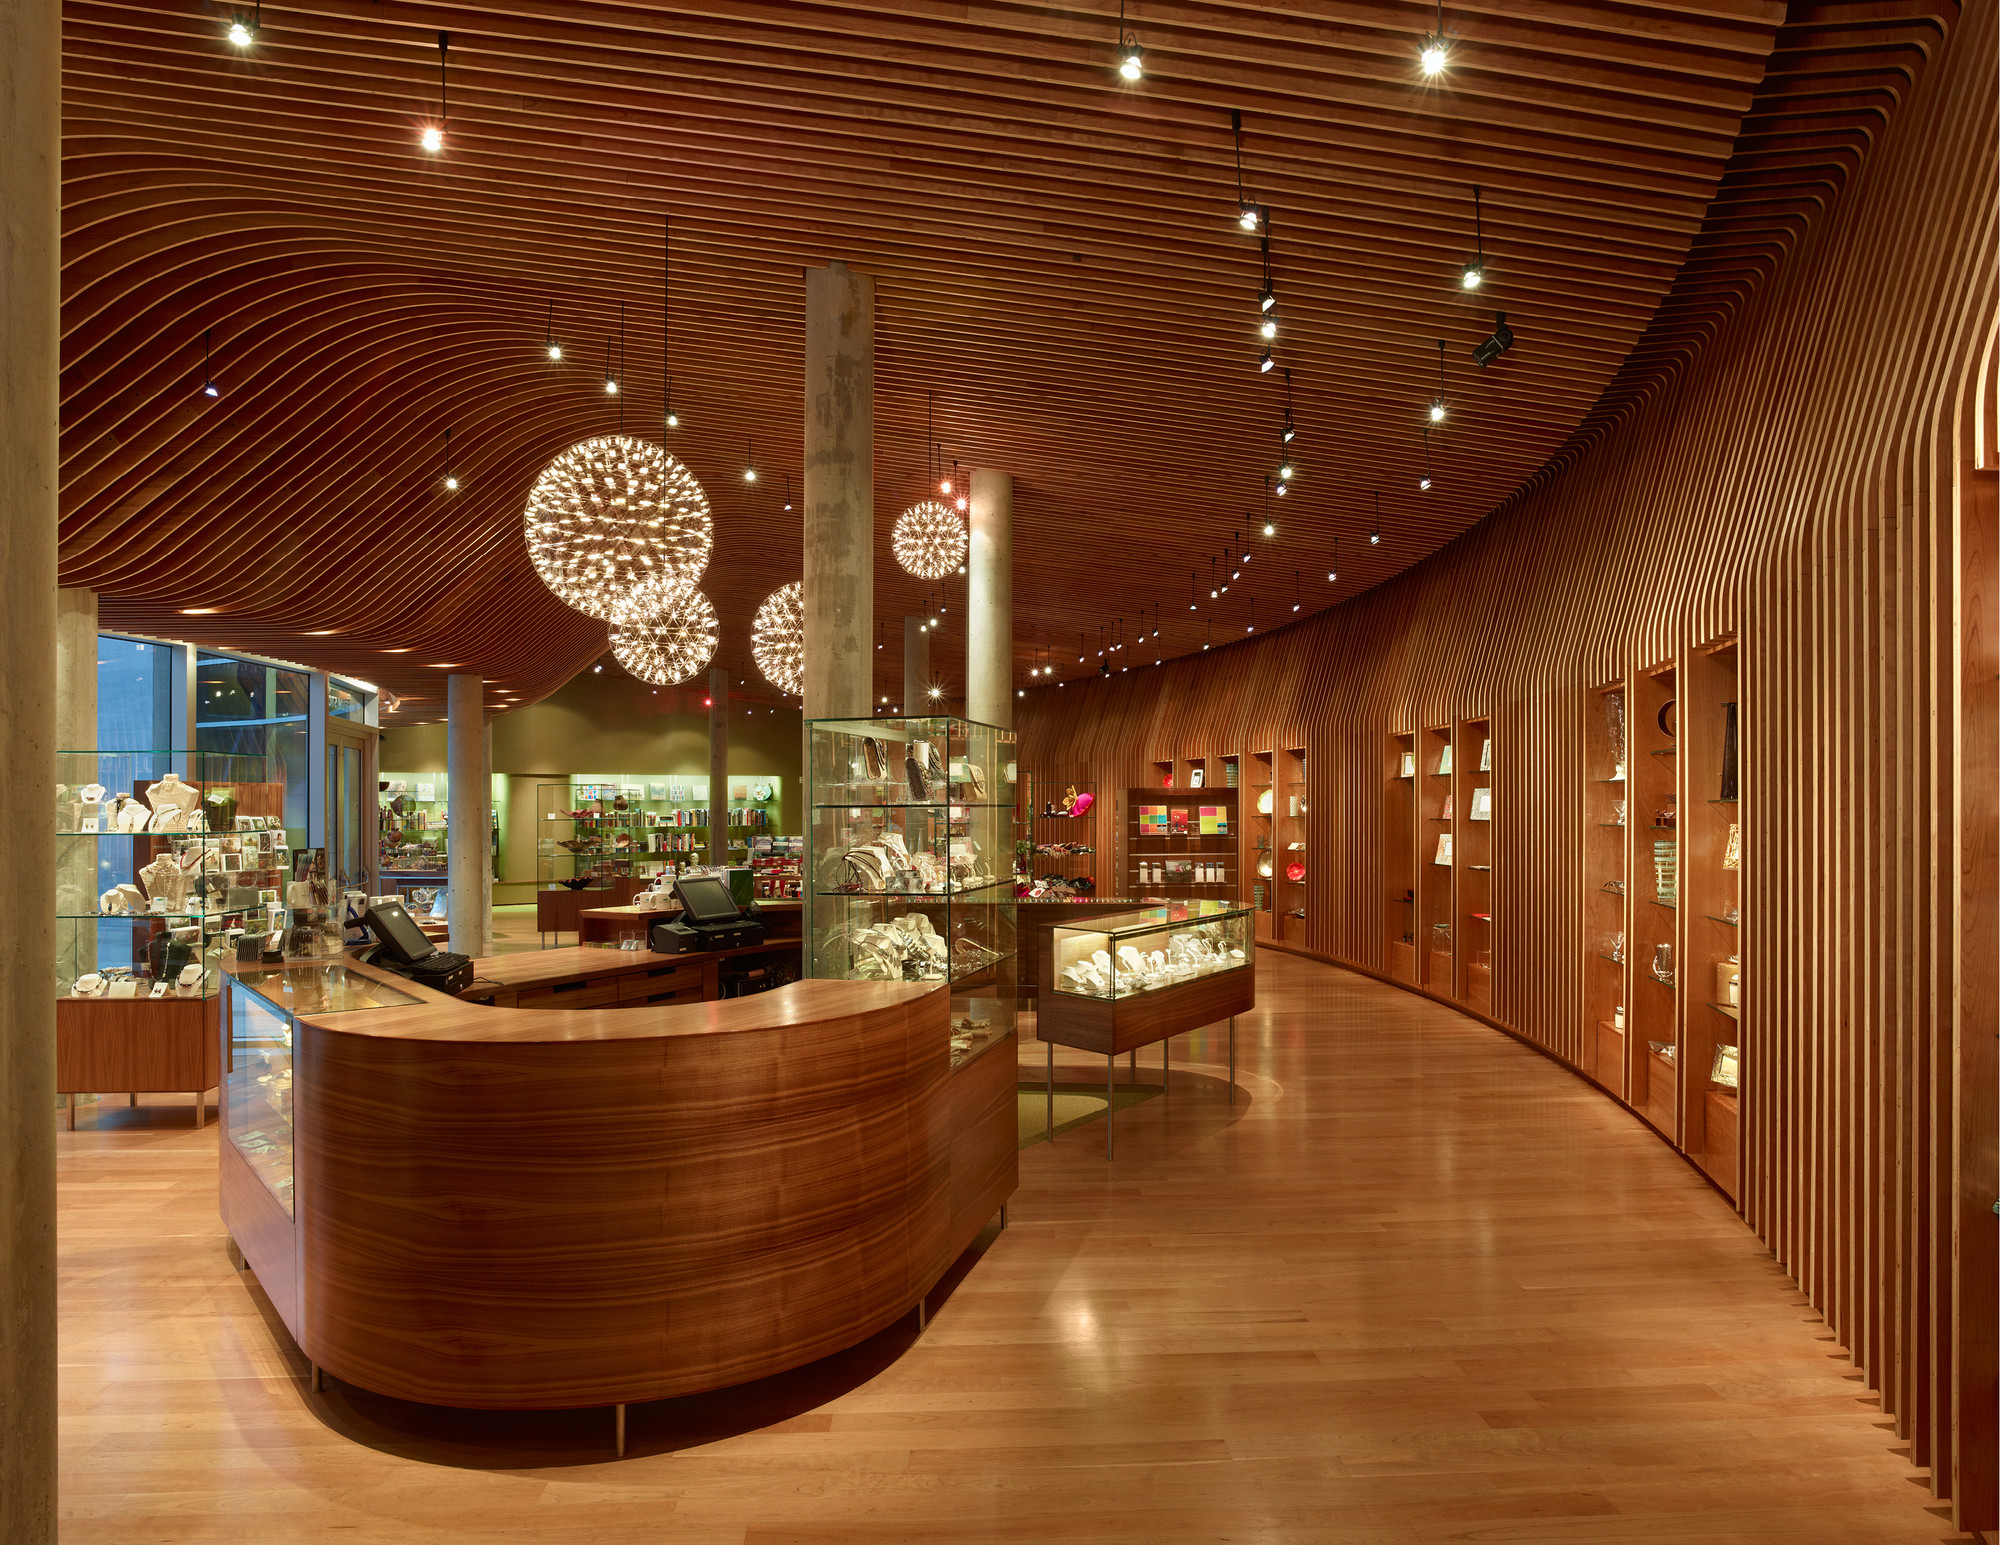 Crystal Bridges Museum Store Marlon Blackwell Architect - 8